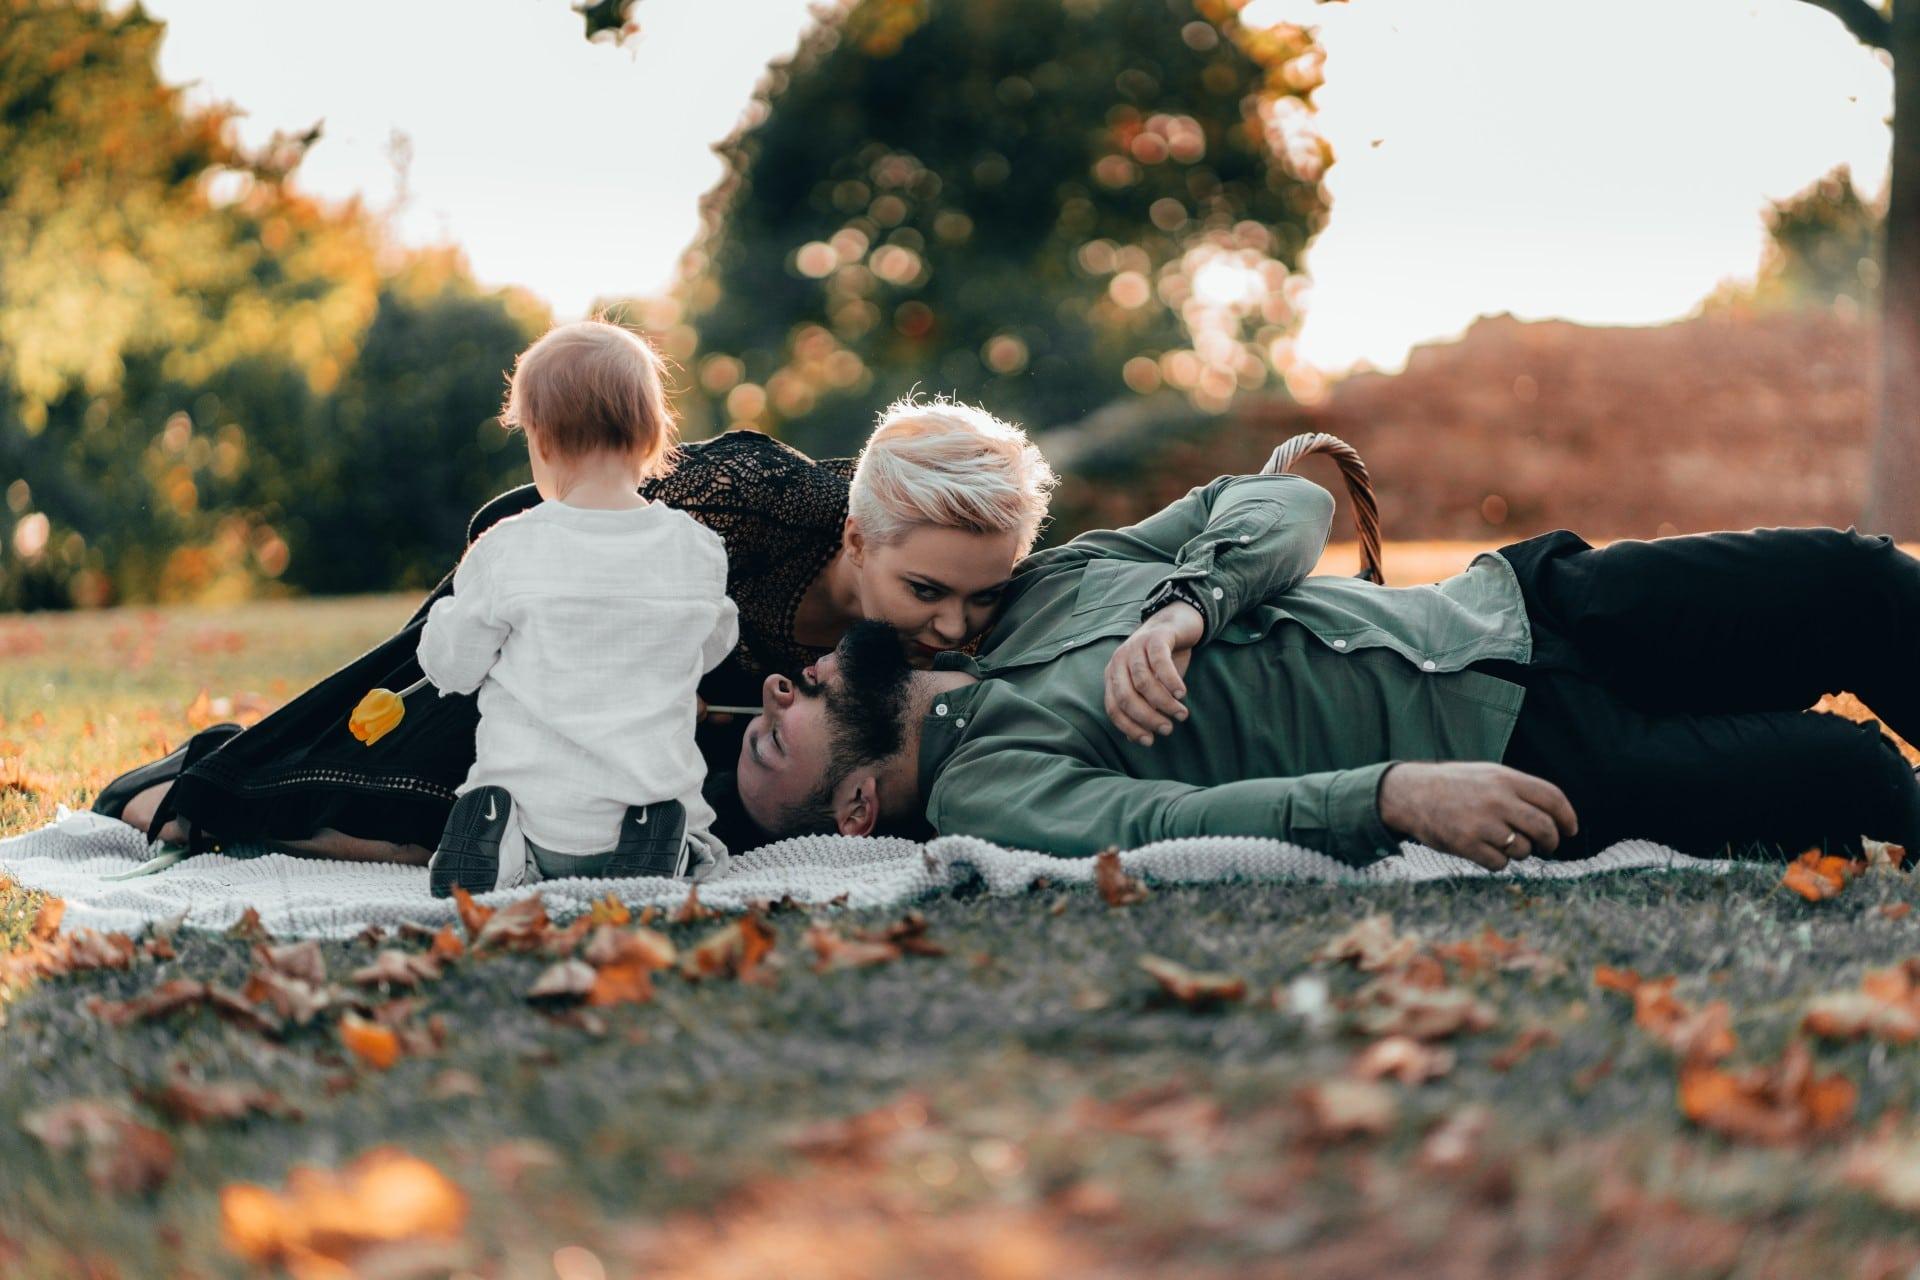 875-daromPictures-Familienfotos-XLU26h3Q